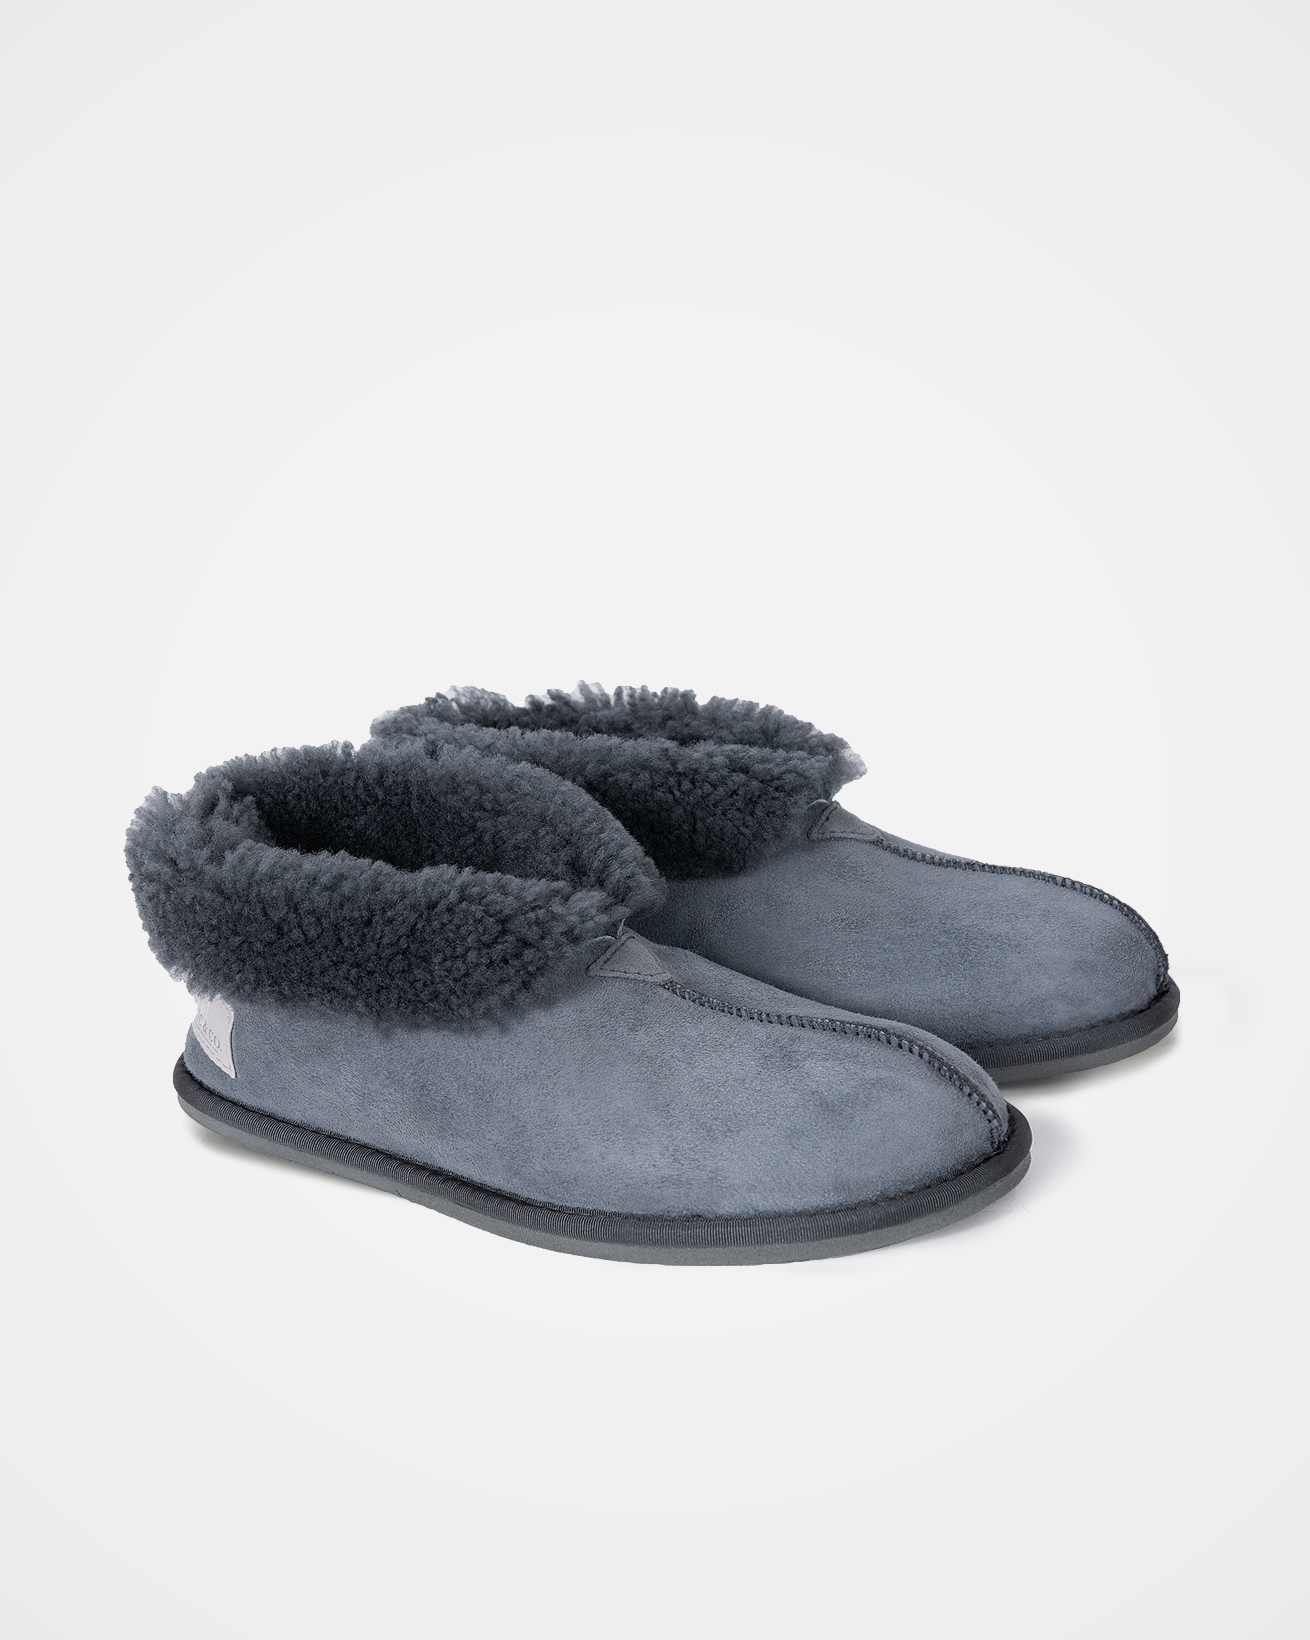 2100-icon-bootee-slipper_pair.jpg